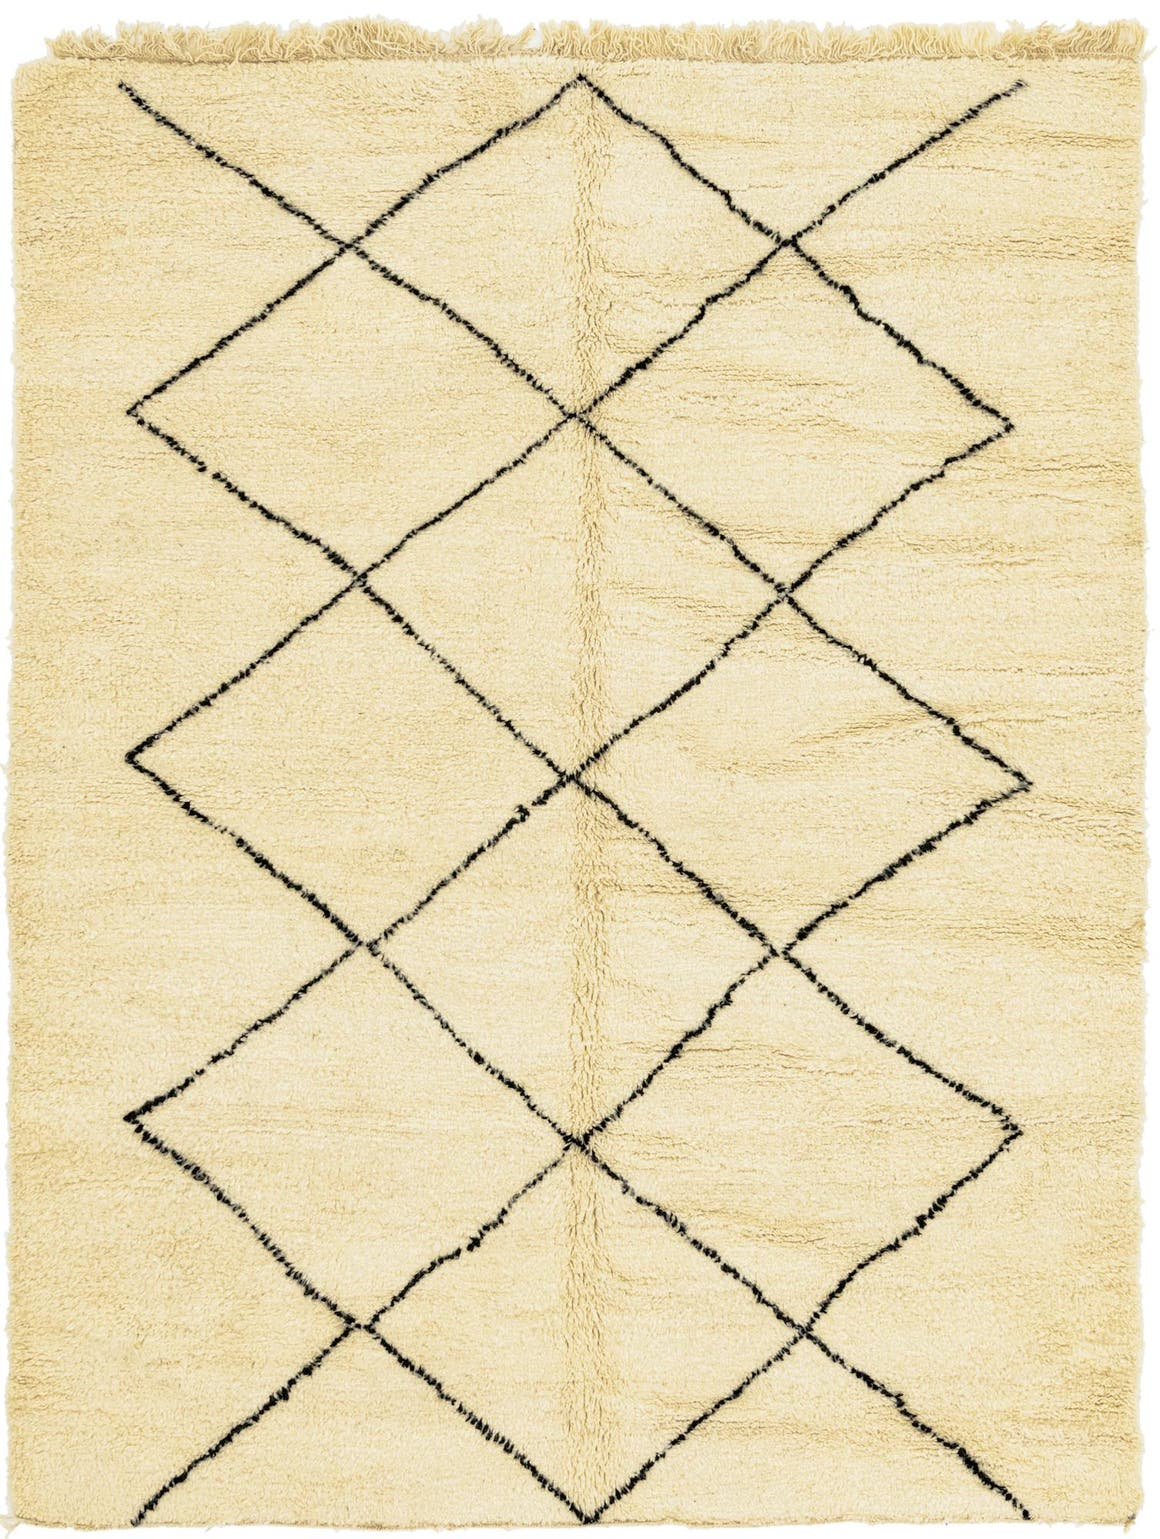 7' x 9' 5 Moroccan Rug main image